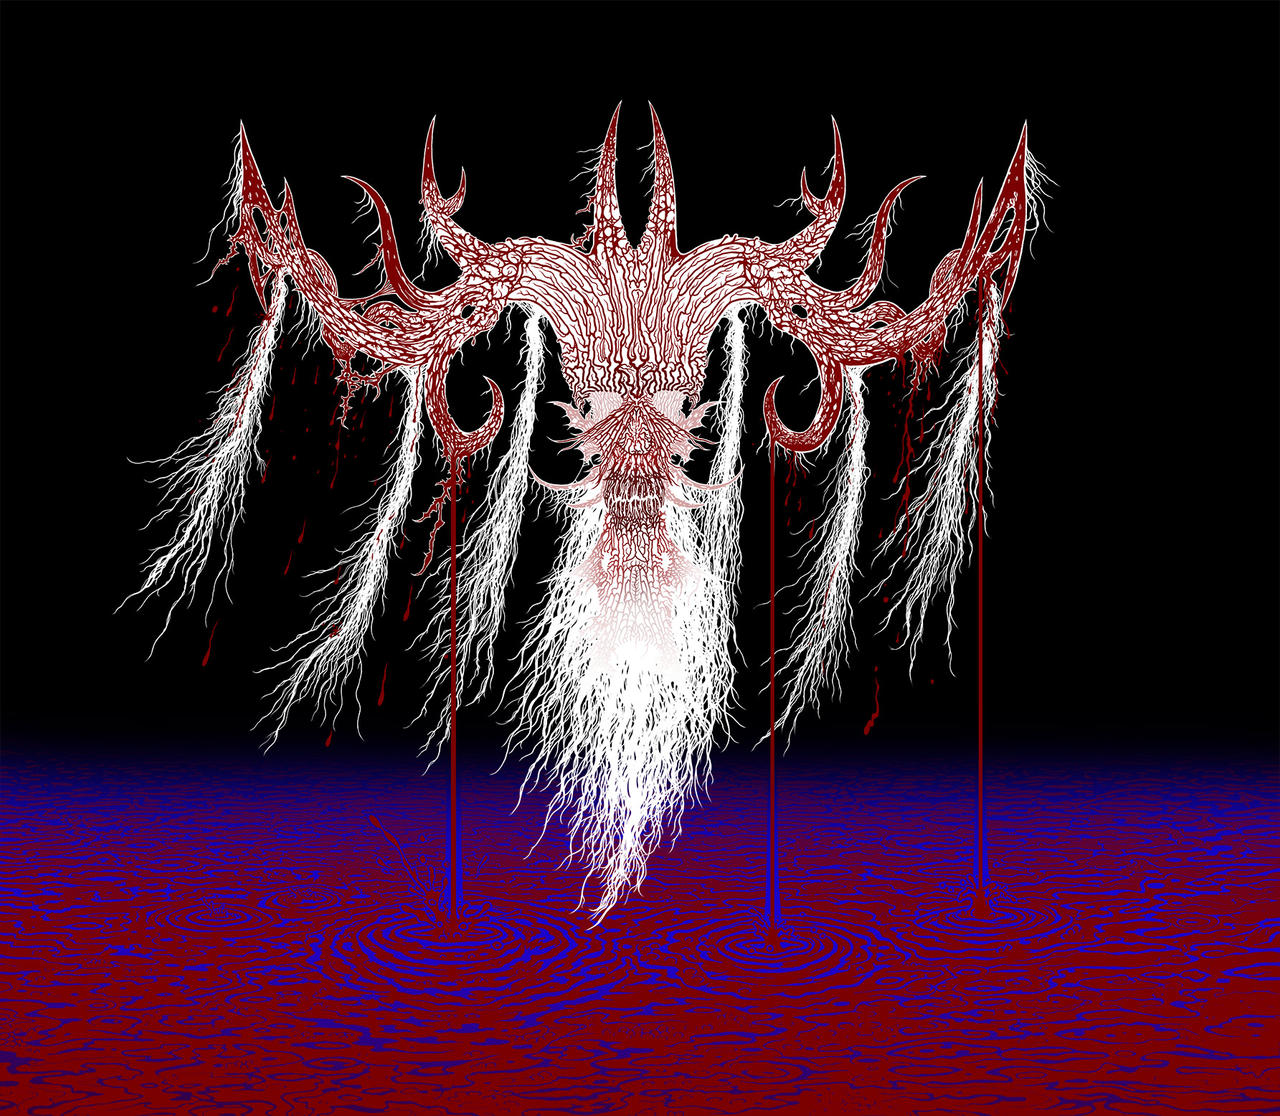 Bloodbath by curtis-macdonald